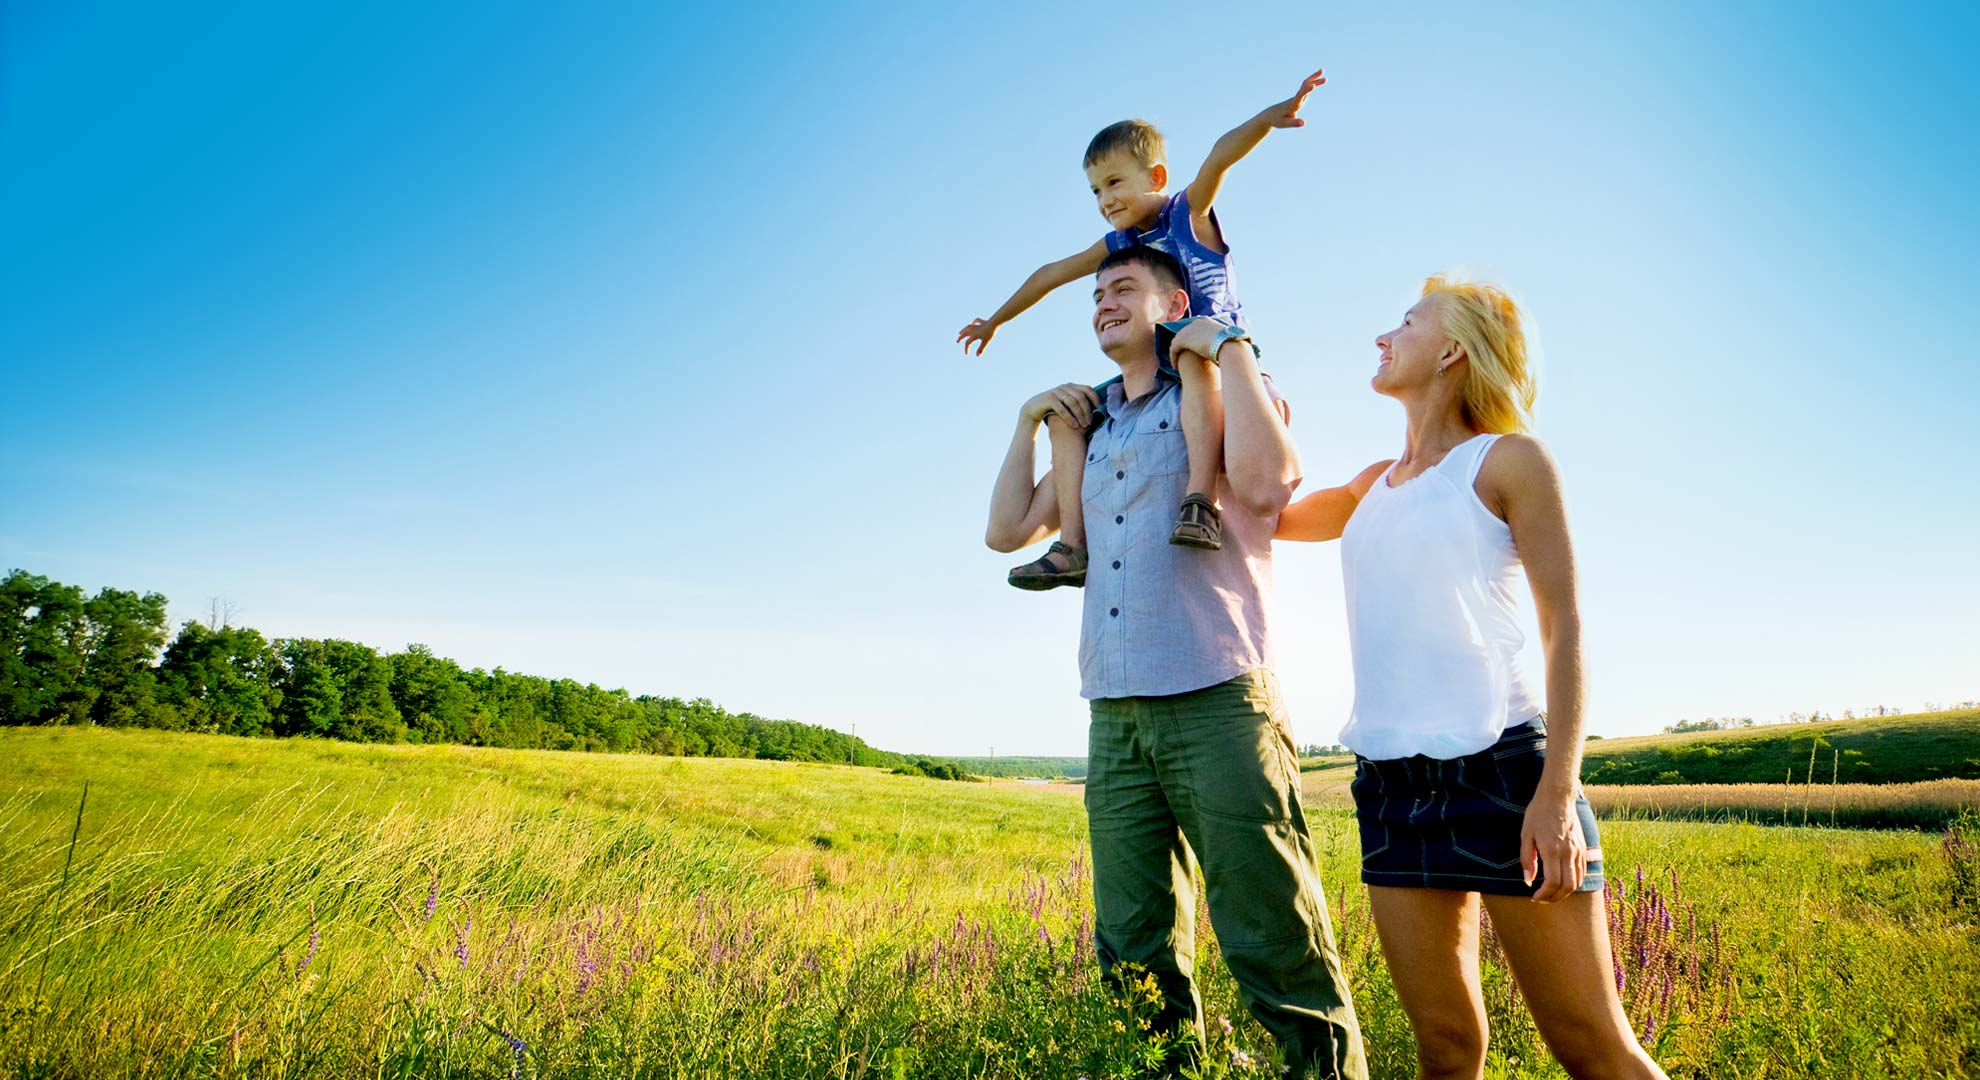 Life Insurance: Should You Buy It?